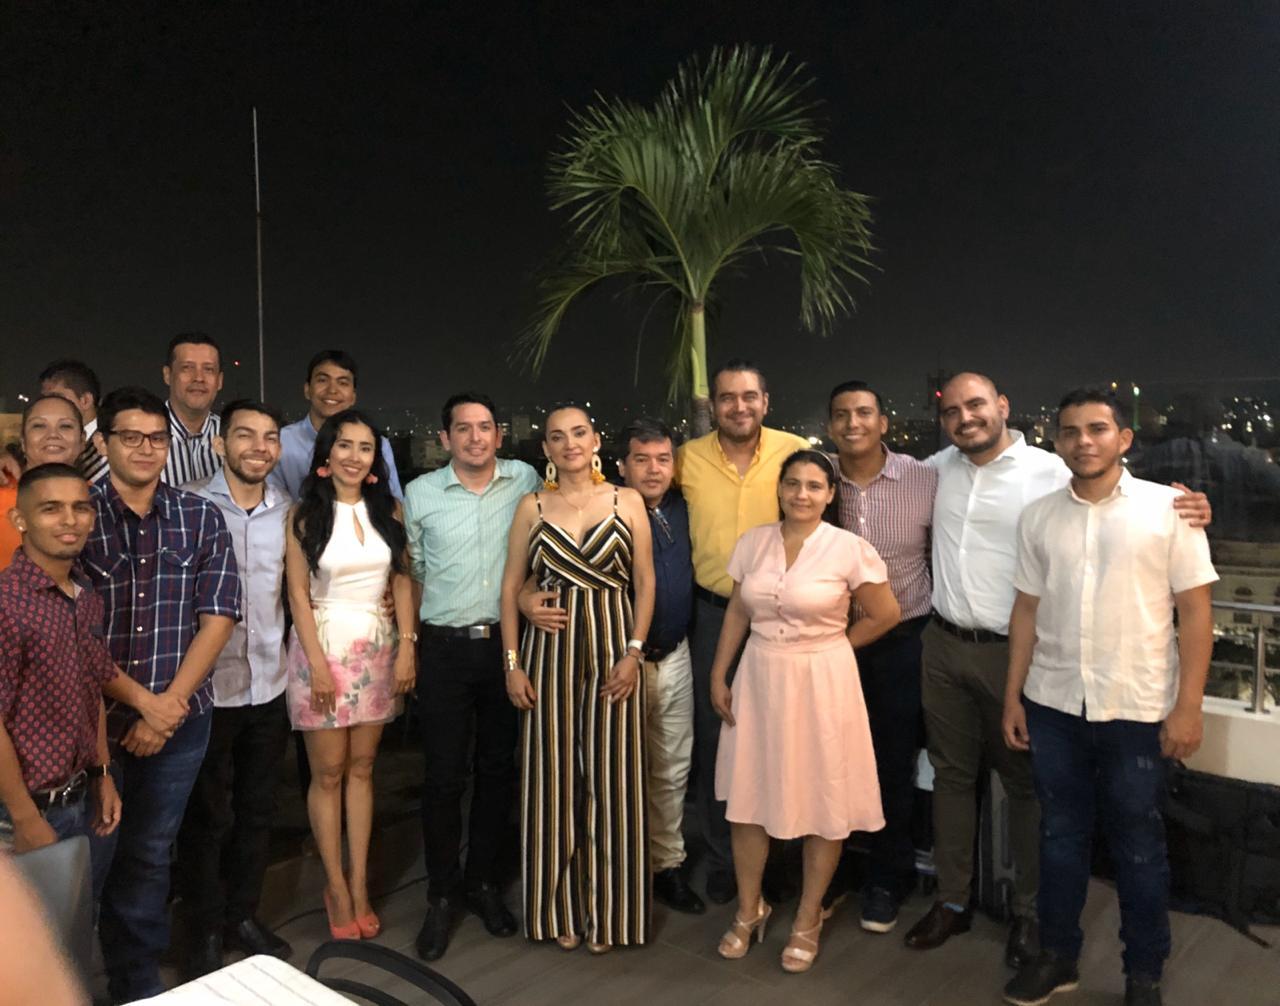 Cena fin año 2019